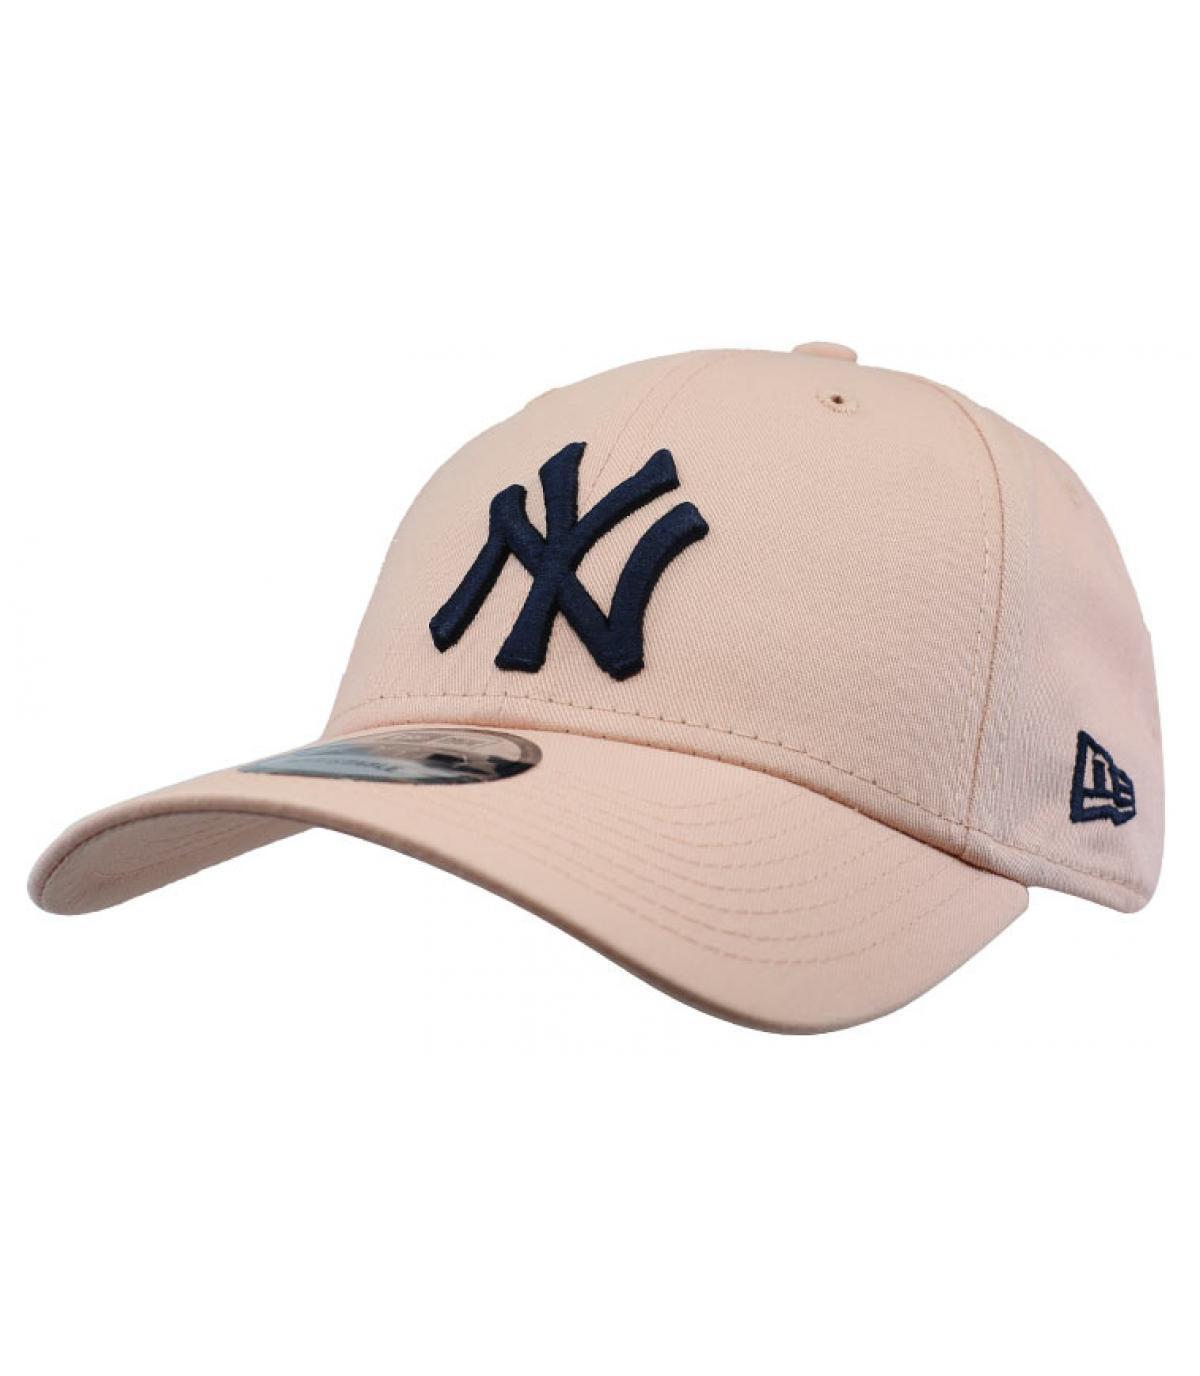 Details Cap League Ess NY 940 blush navy - Abbildung 2